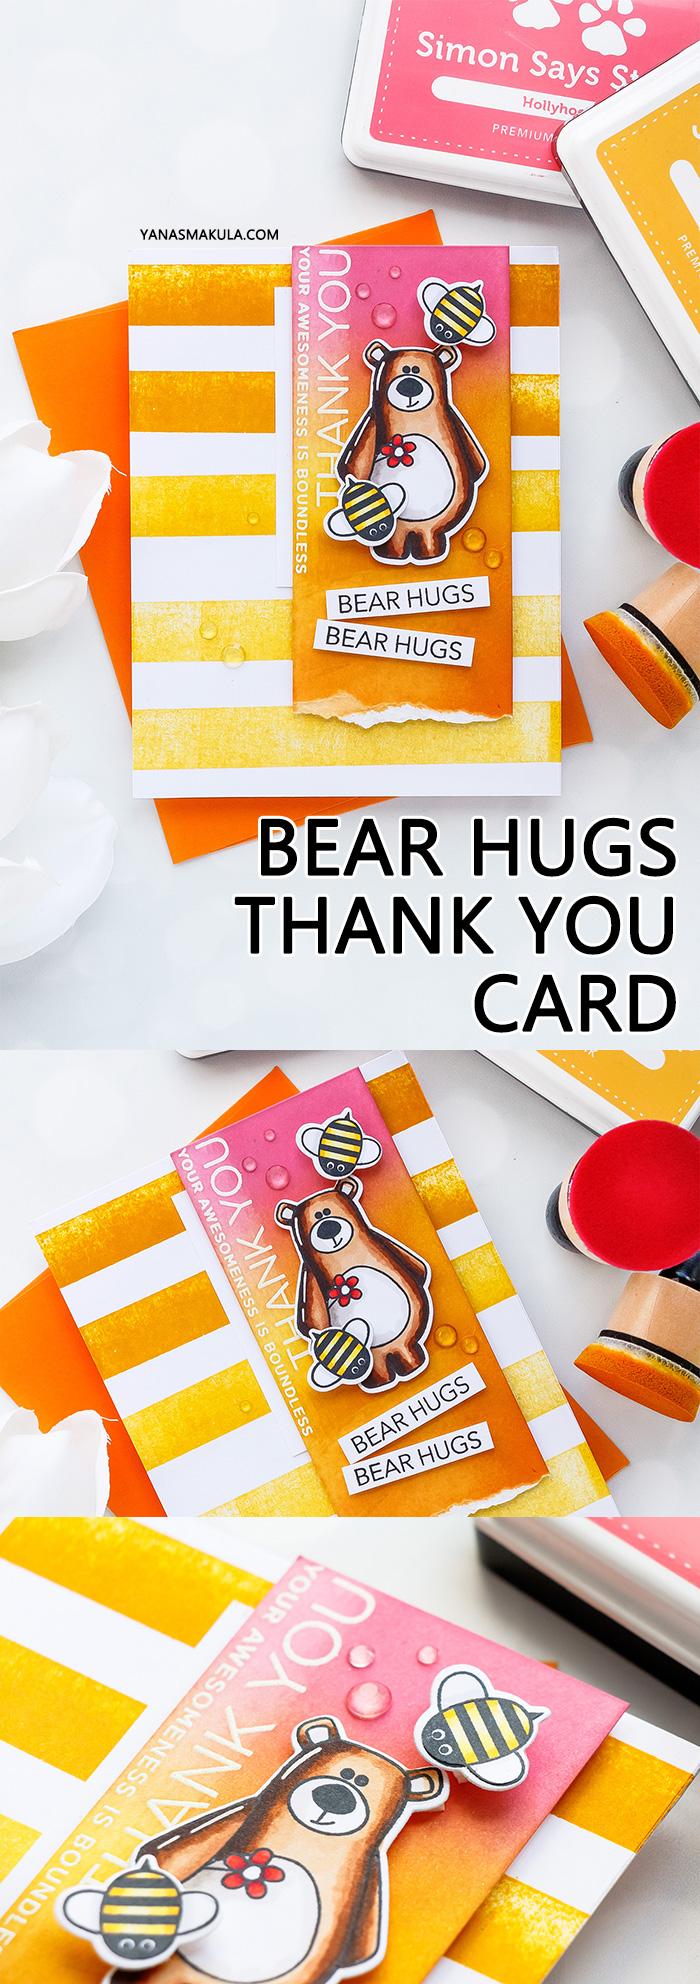 Simon Says Stamp | Thank You - Bear Hugs Card by Yana Smakula